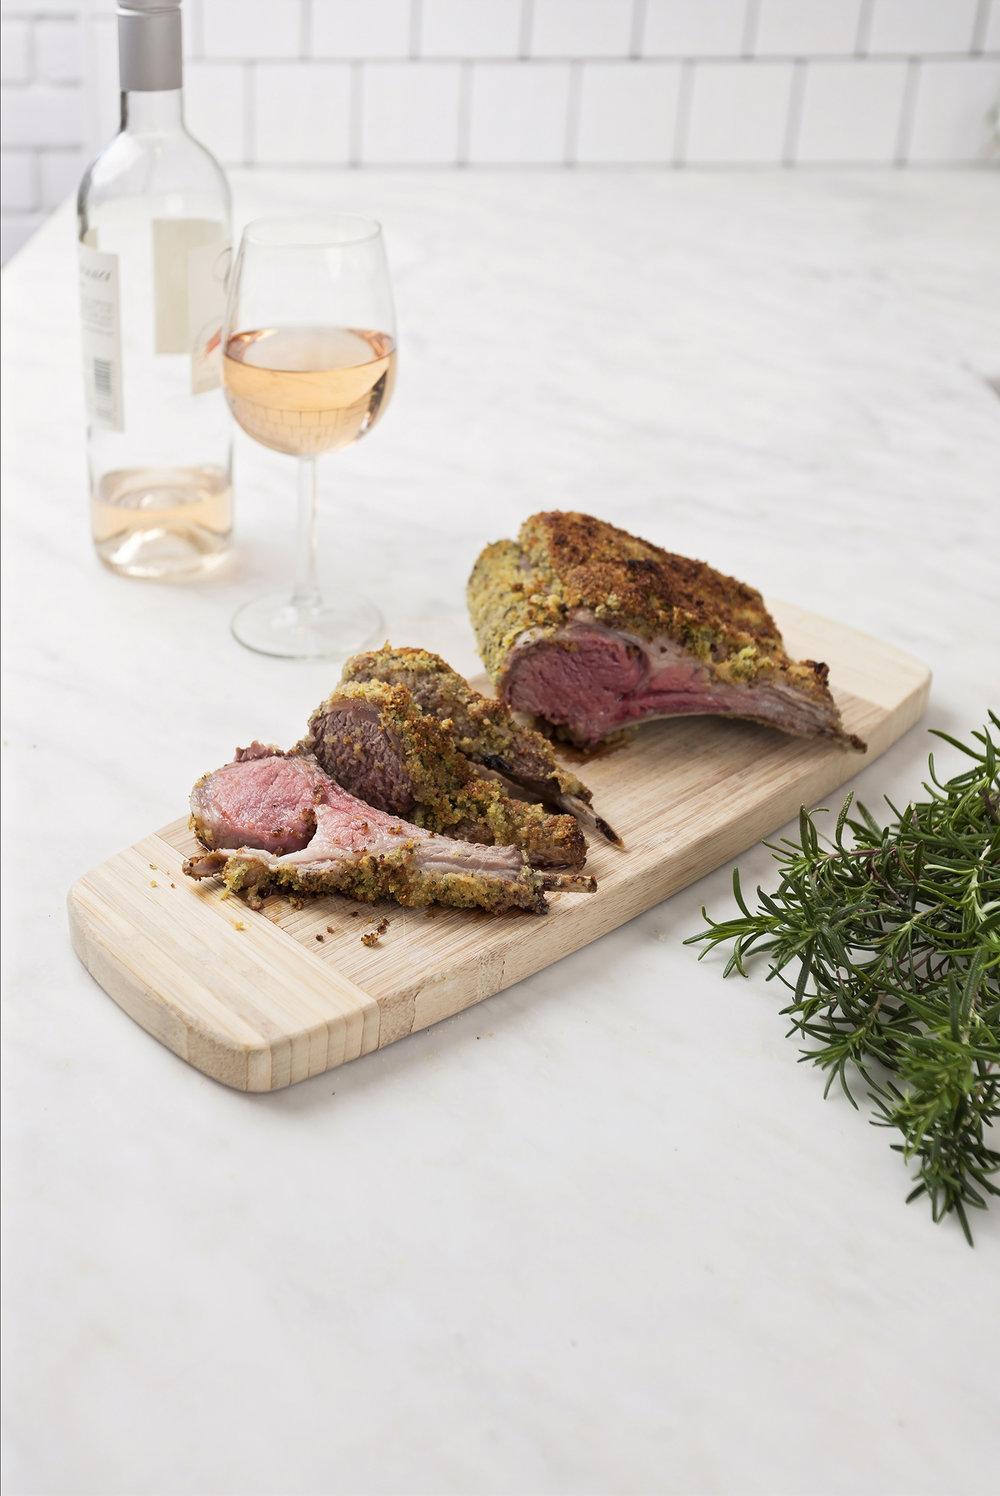 Herb crusted rack of spring lamb - my favorite!